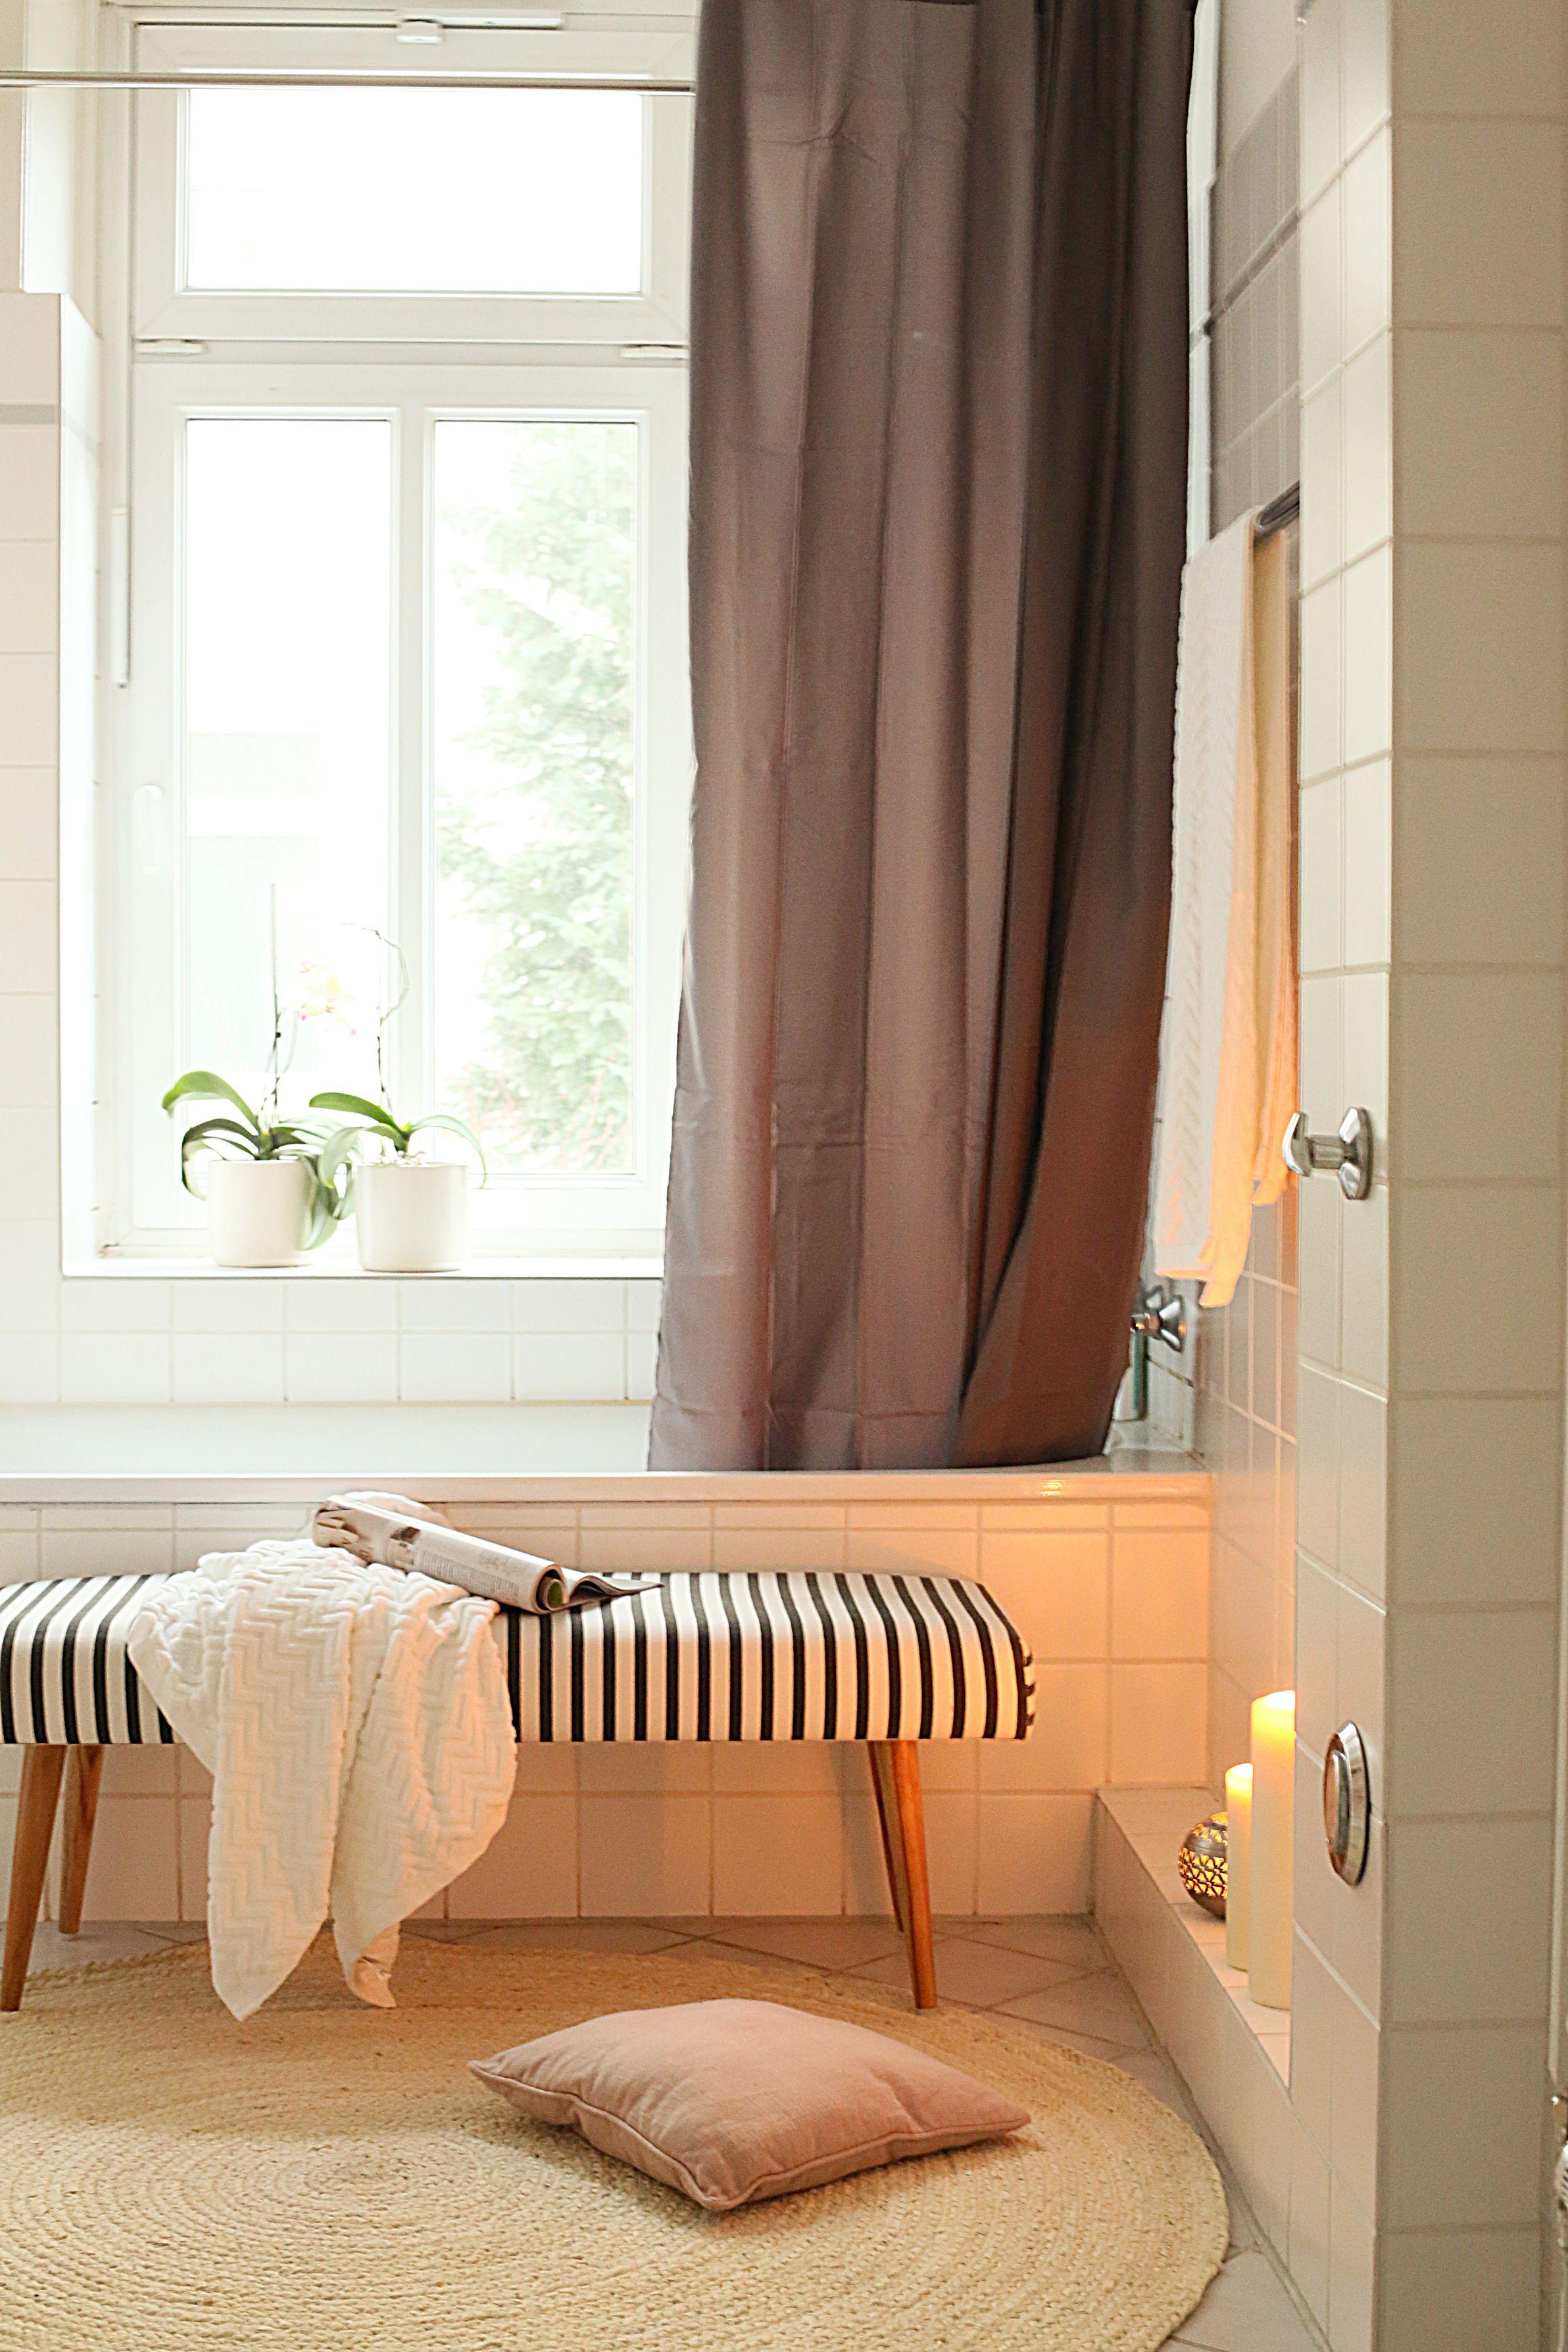 badezimmer altbau, bad, badezimmer, altbau, house doctor,, ikea, bathroom, interior, Badezimmer